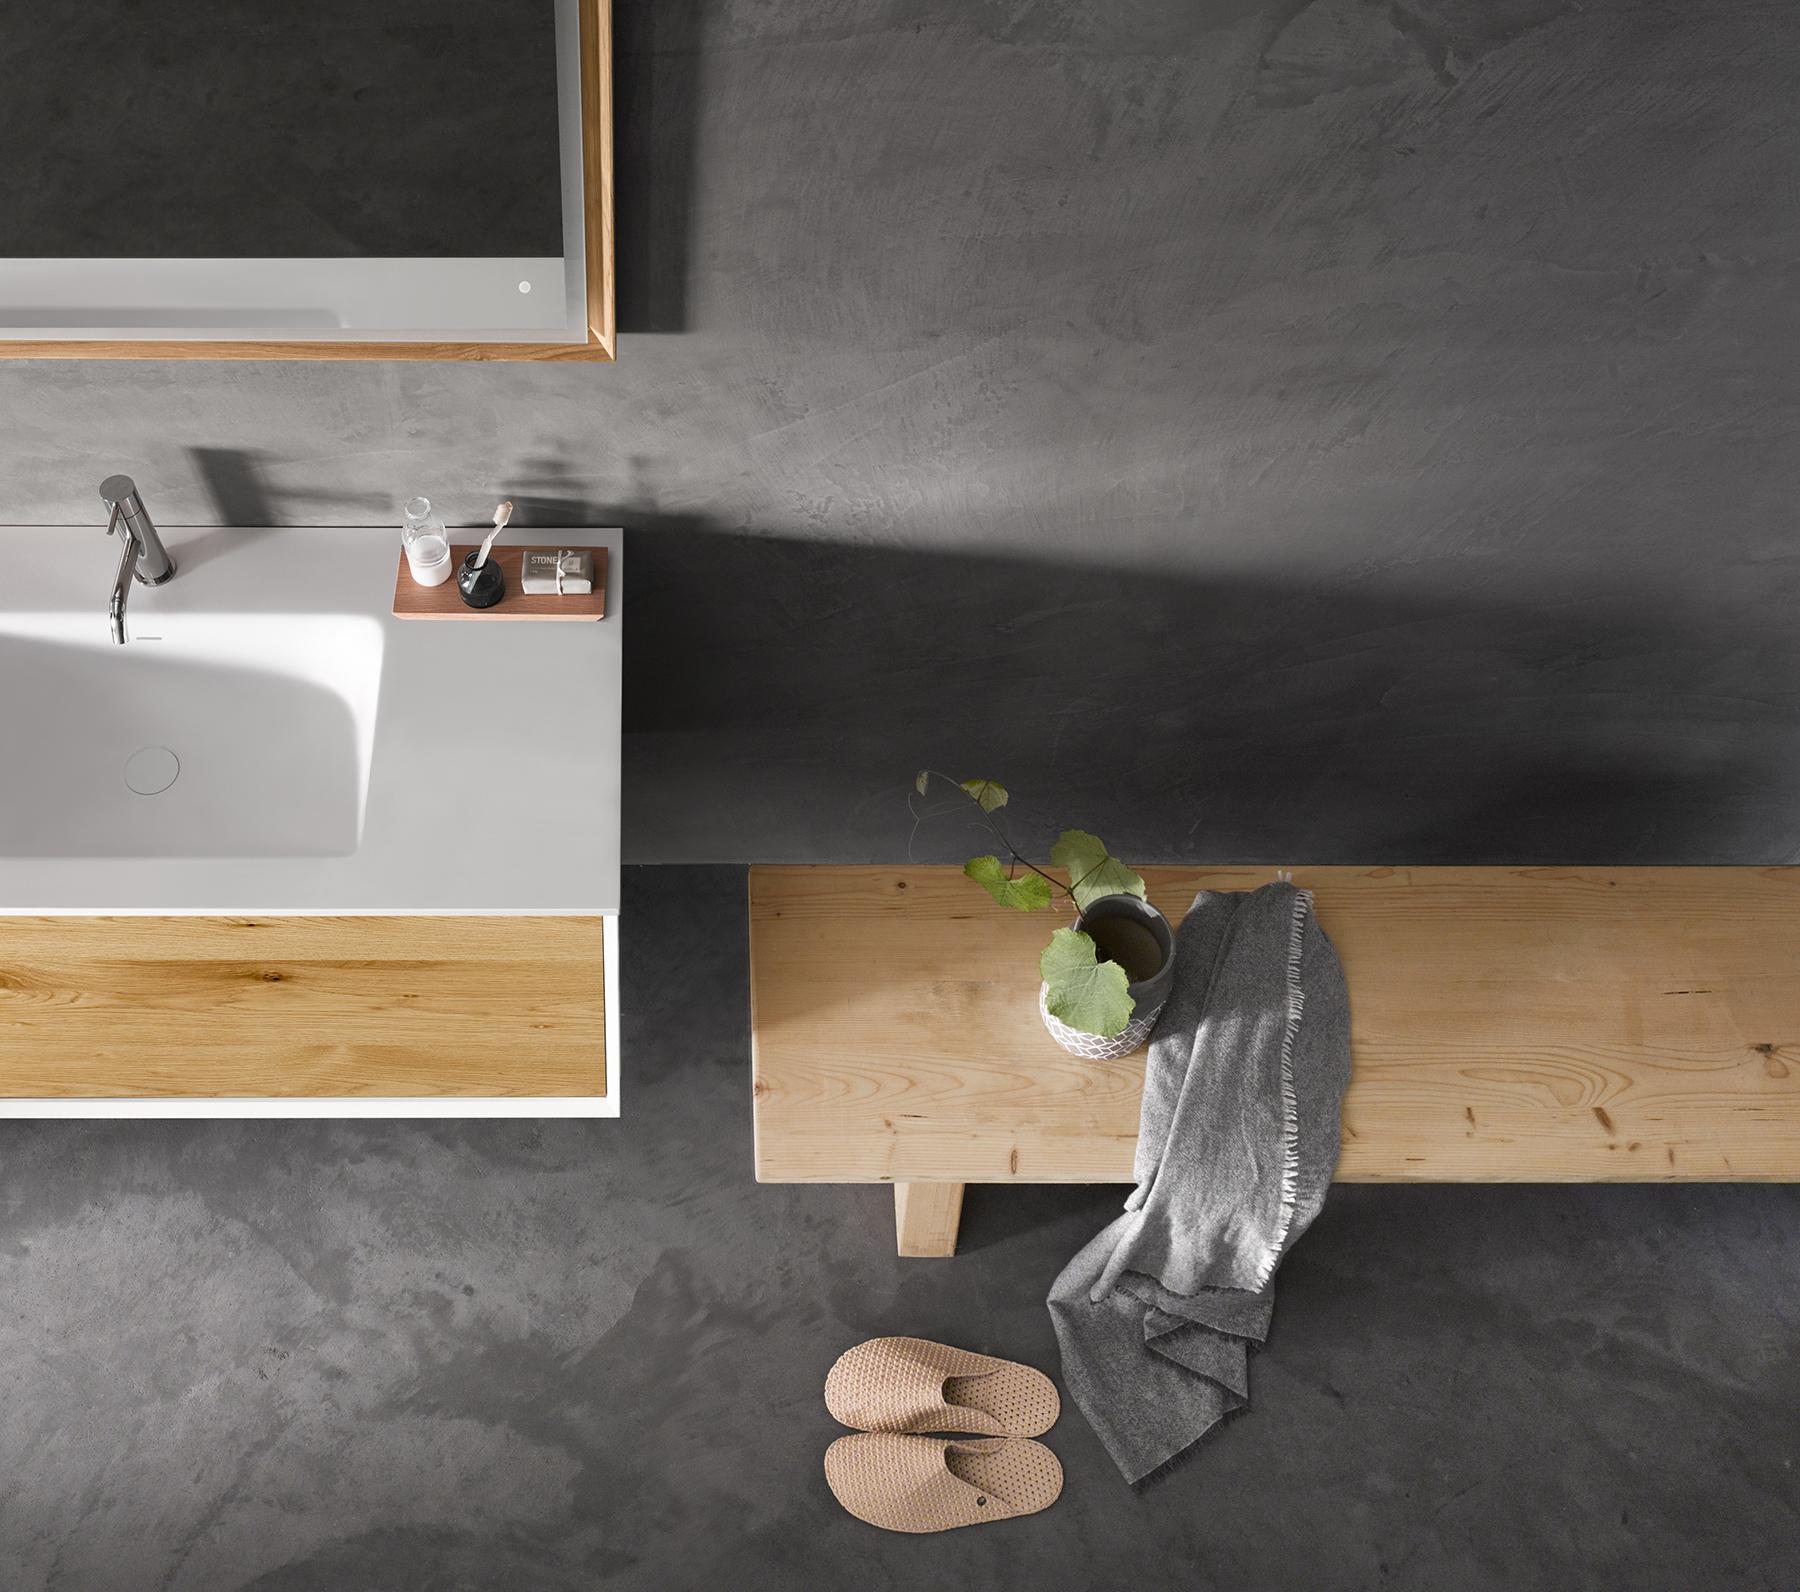 Modern 45 Degree Full Wall Mount Vanity Series 1200